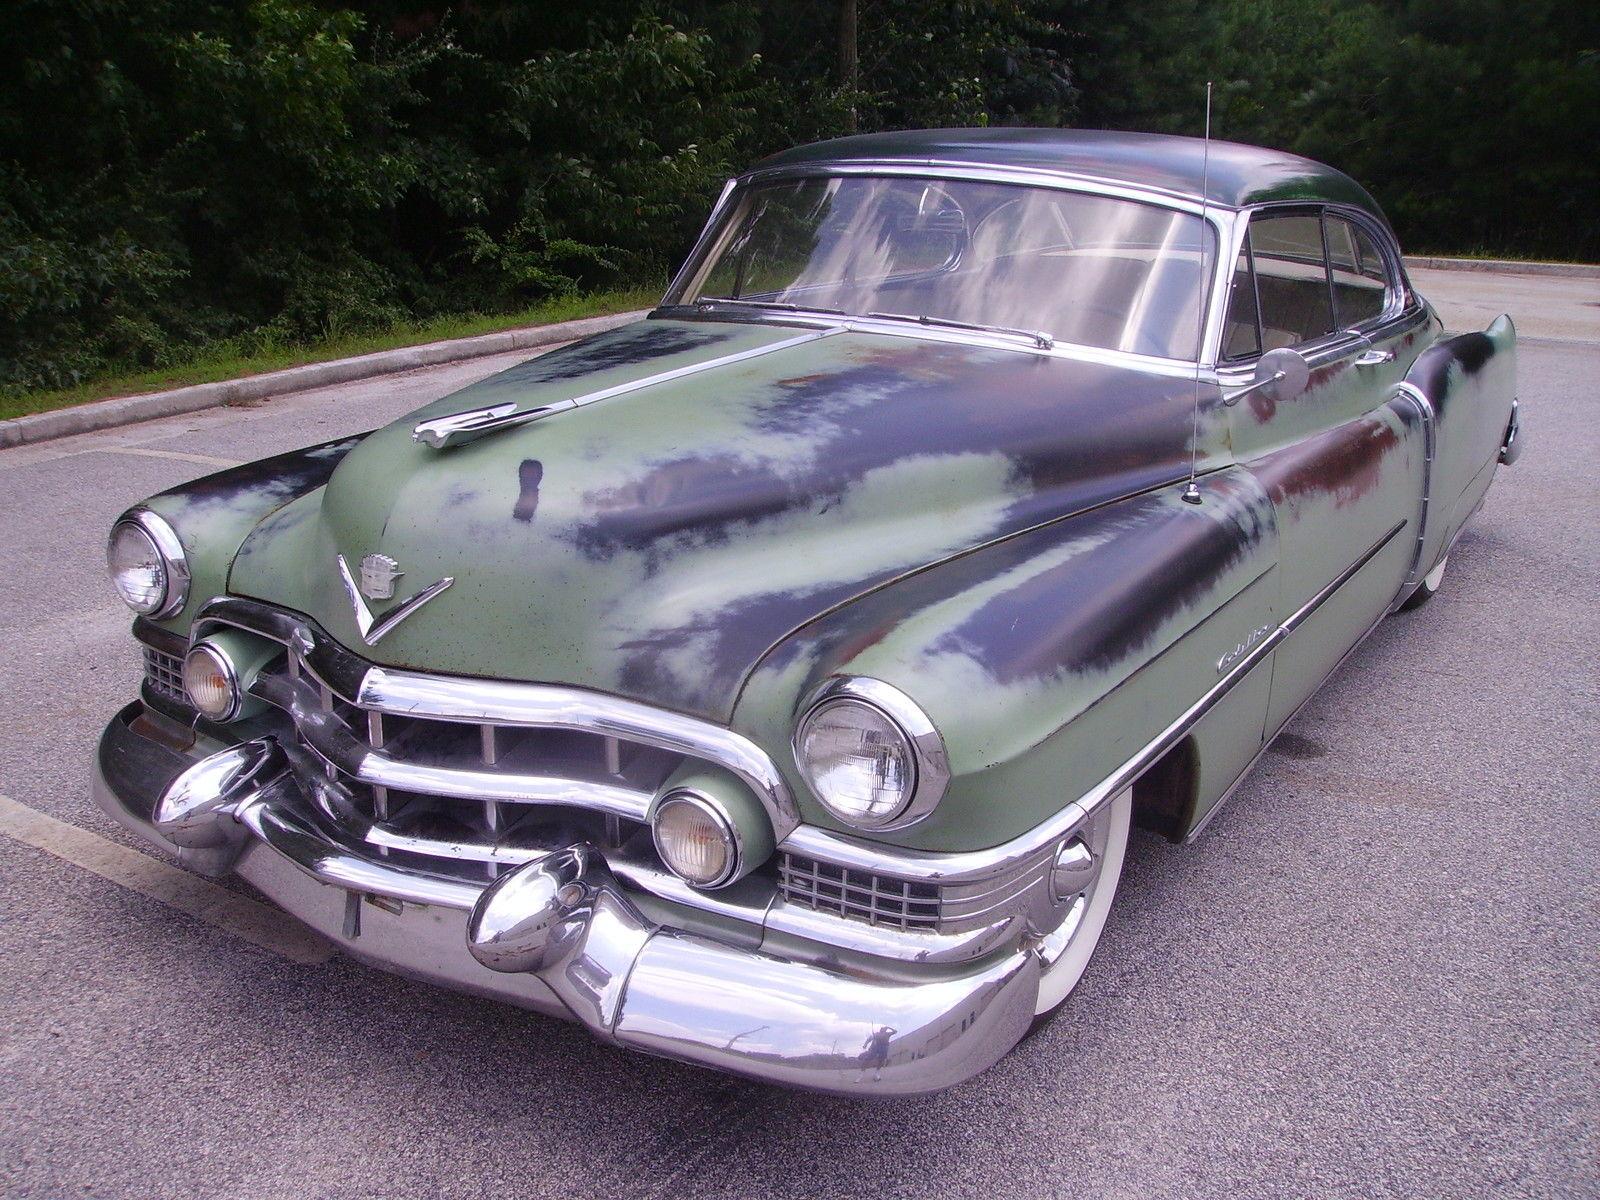 1951 Cadillac Deville Crate 350 Engine P S B A C New Interior Nova Ferrari Wiring Harness Sub Frame